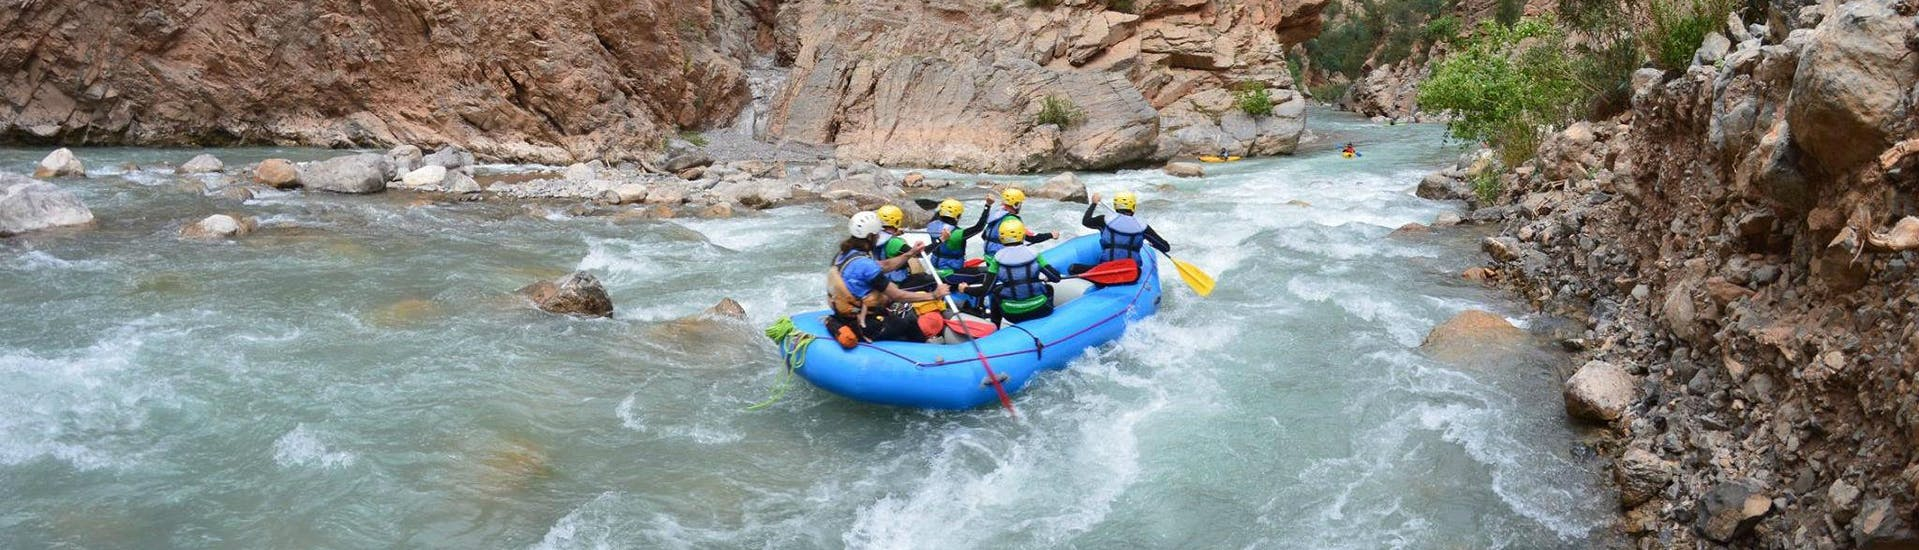 rafting-kids-tour---rio-guadalfeo-gualay-aventura-hero